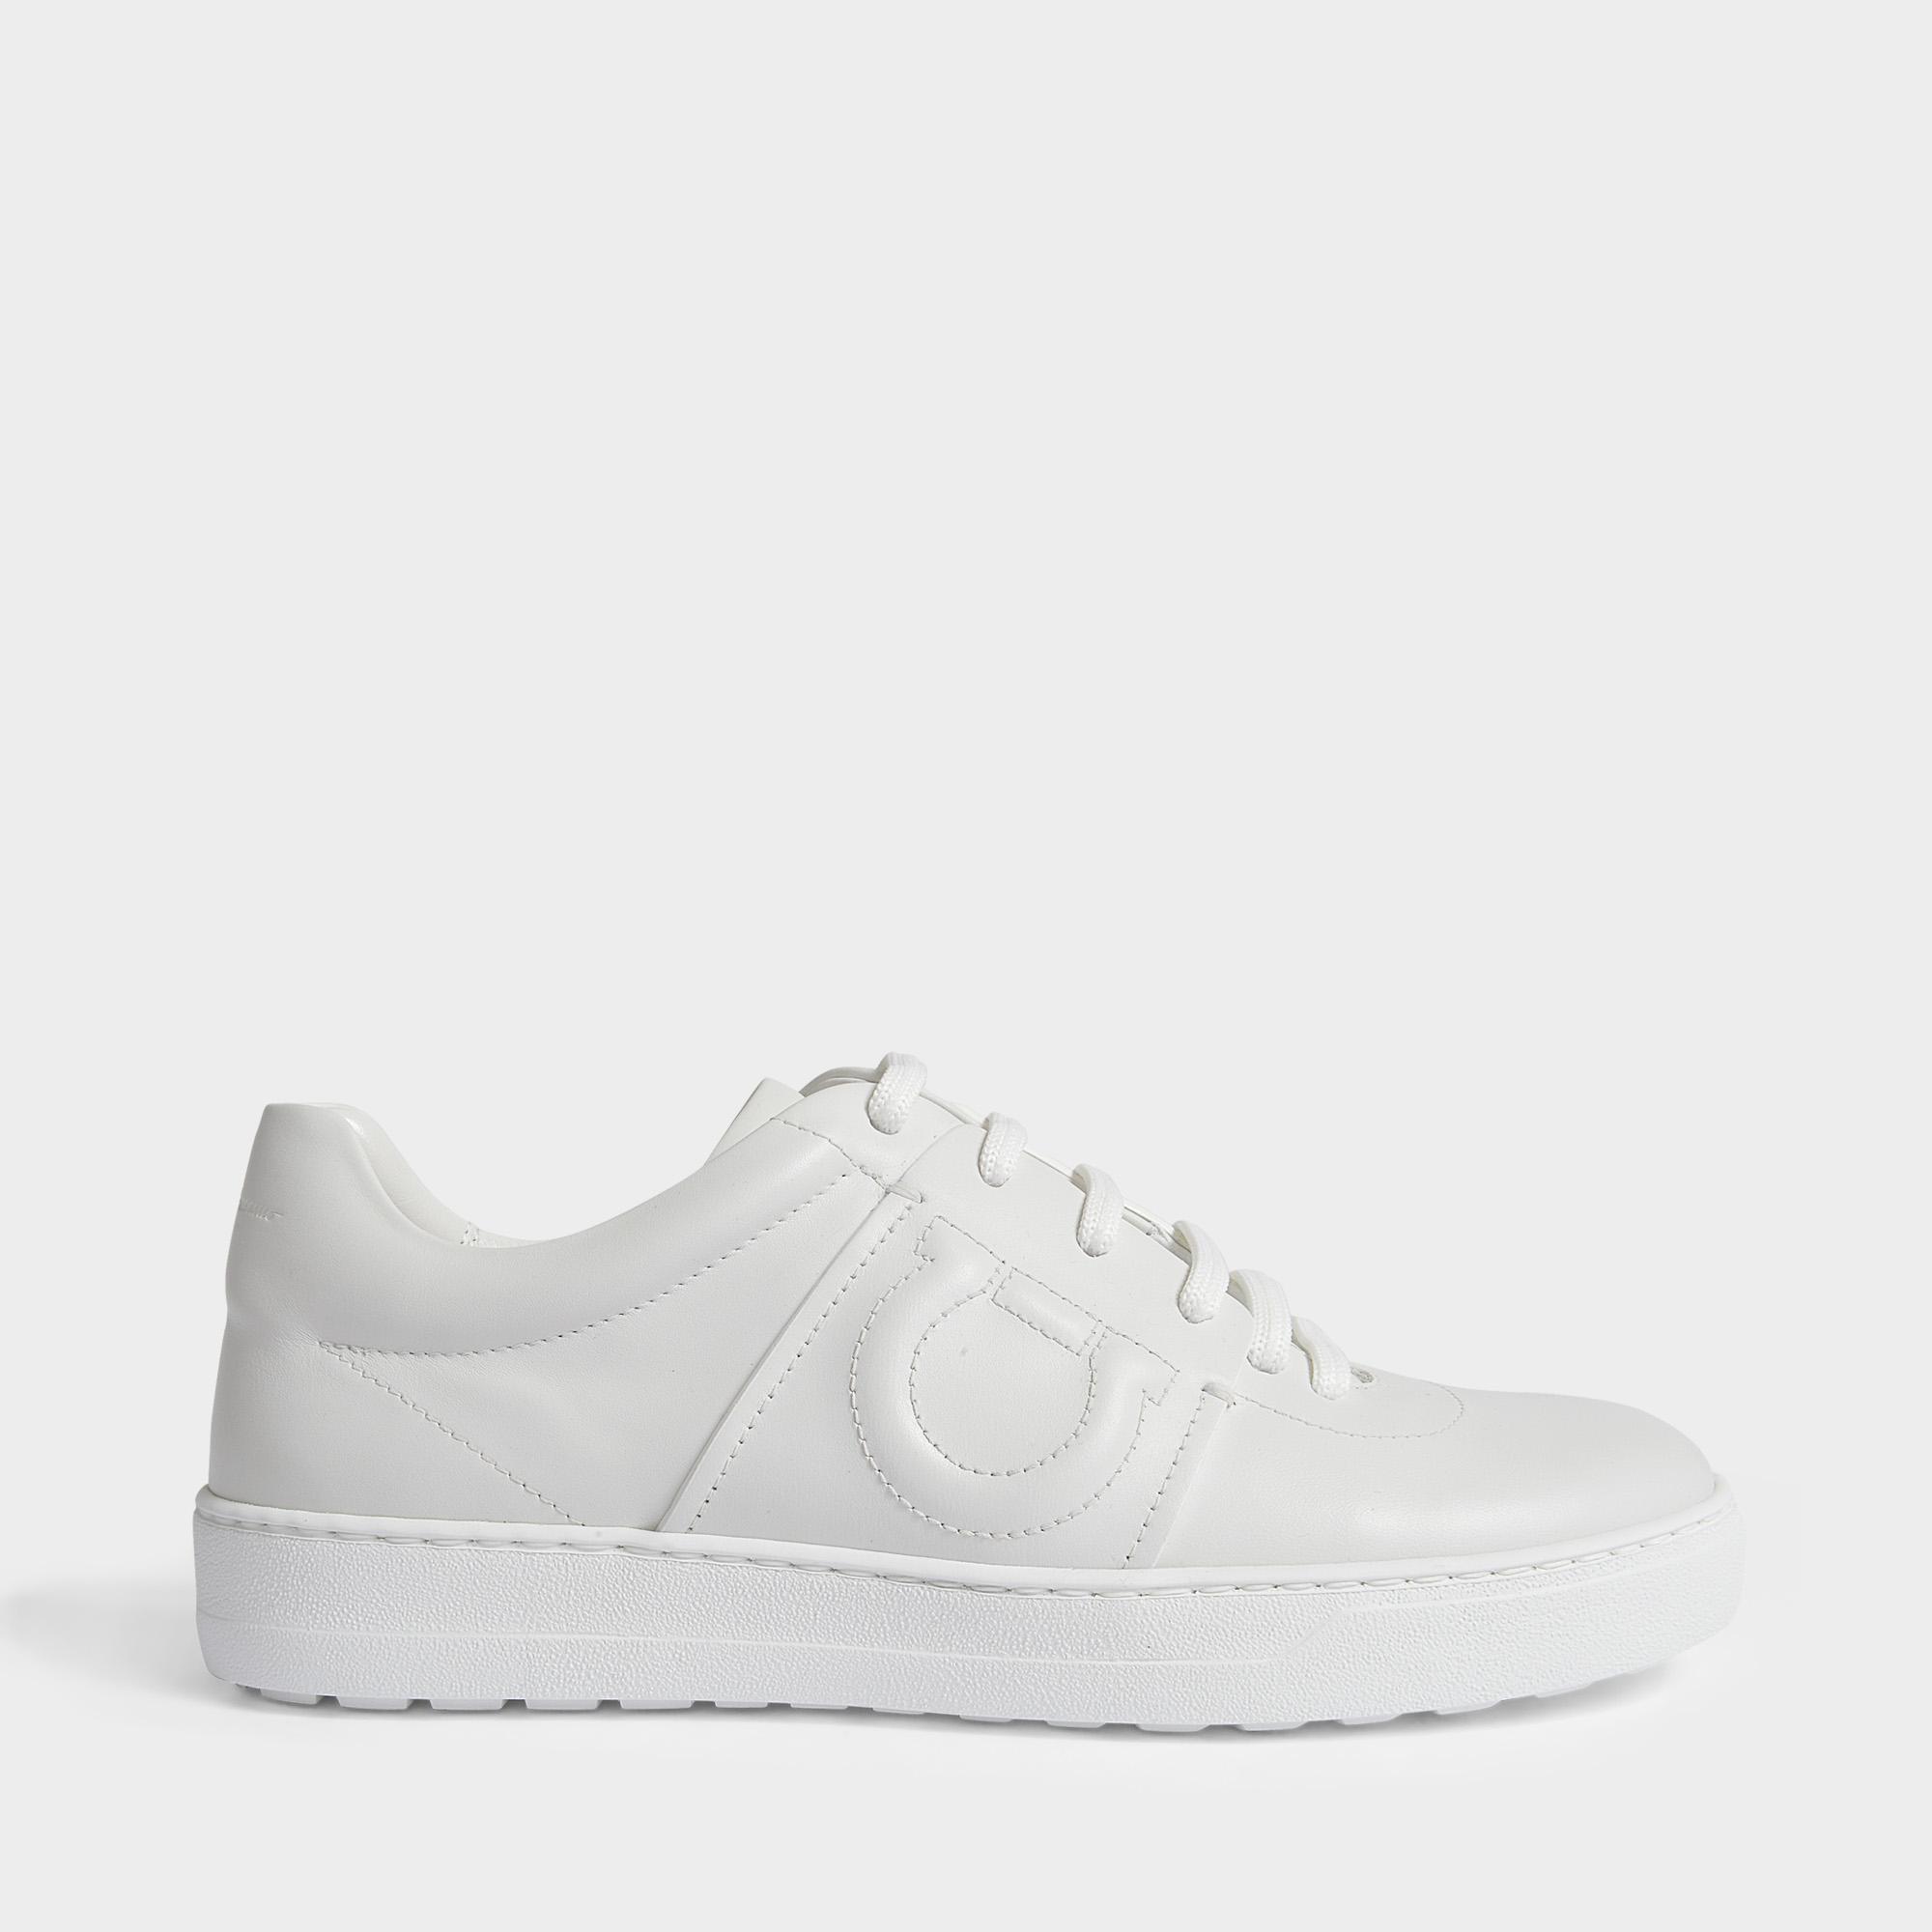 d1b5f66d98 Ferragamo Fasano Sneakers In White Nimes Leather in White - Lyst